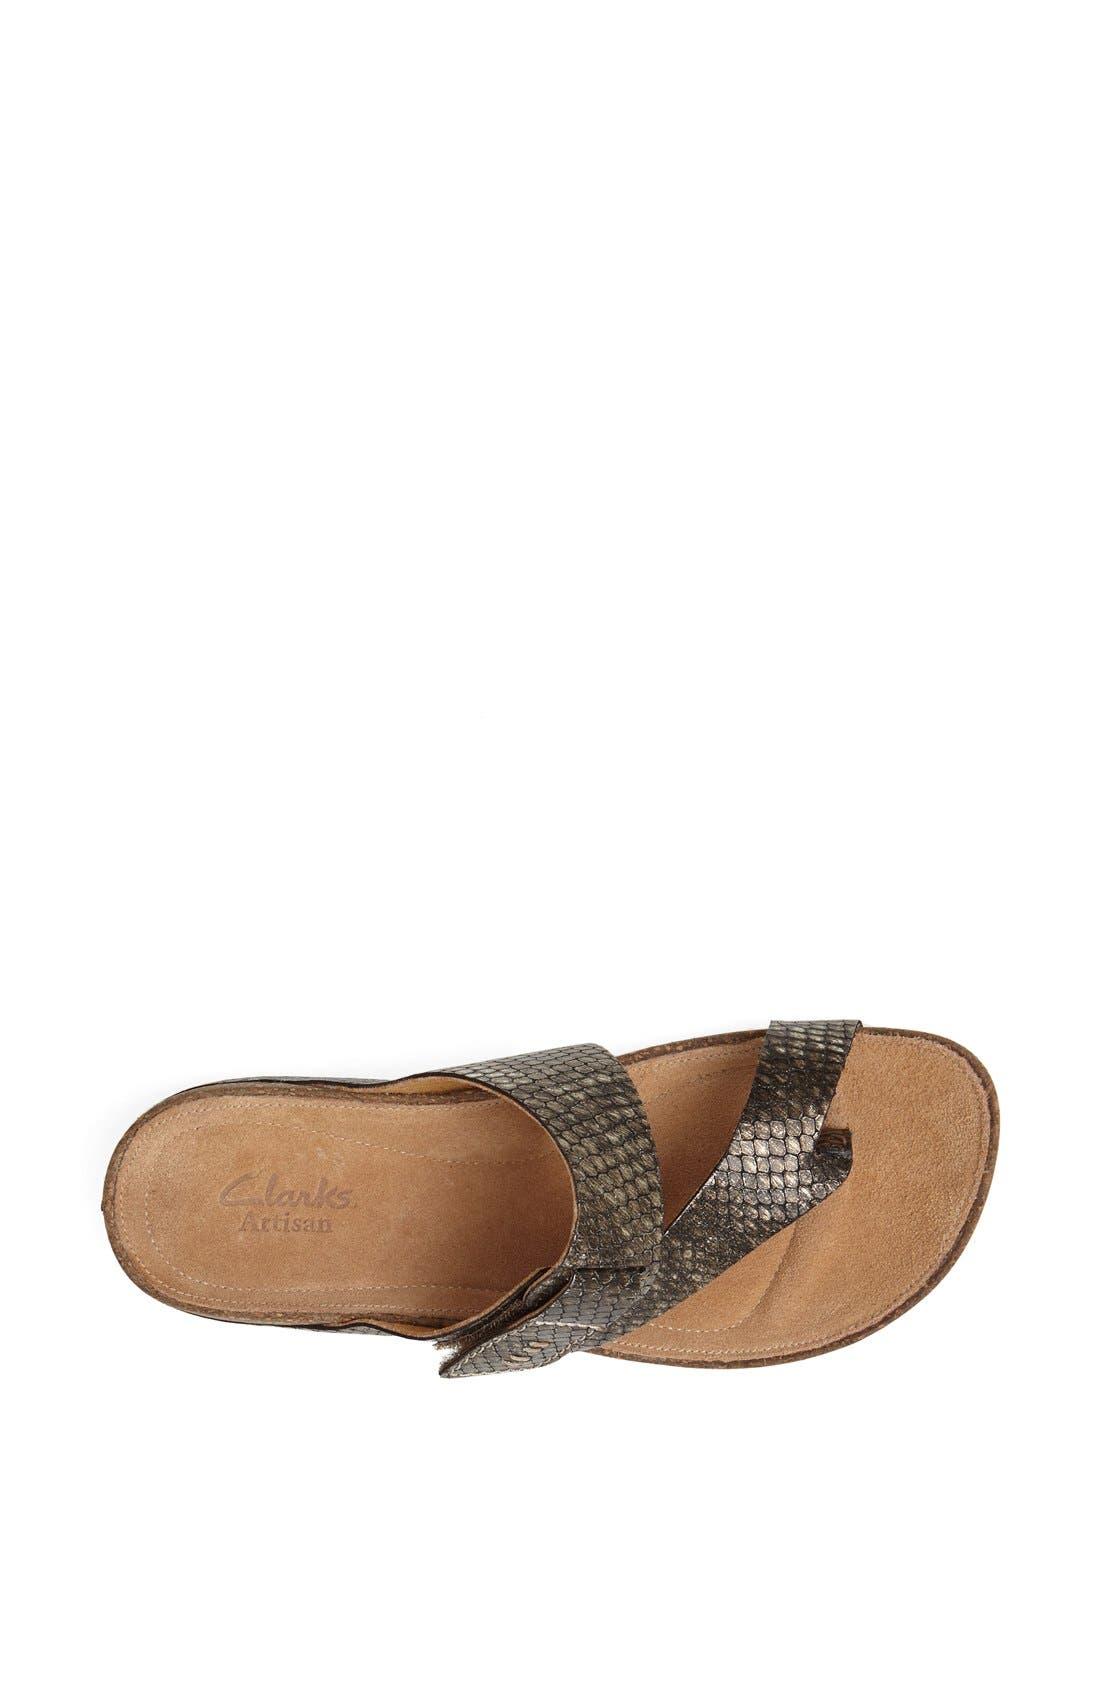 Alternate Image 3  - Clarks® 'Perri Coast' Leather Thong Sandal